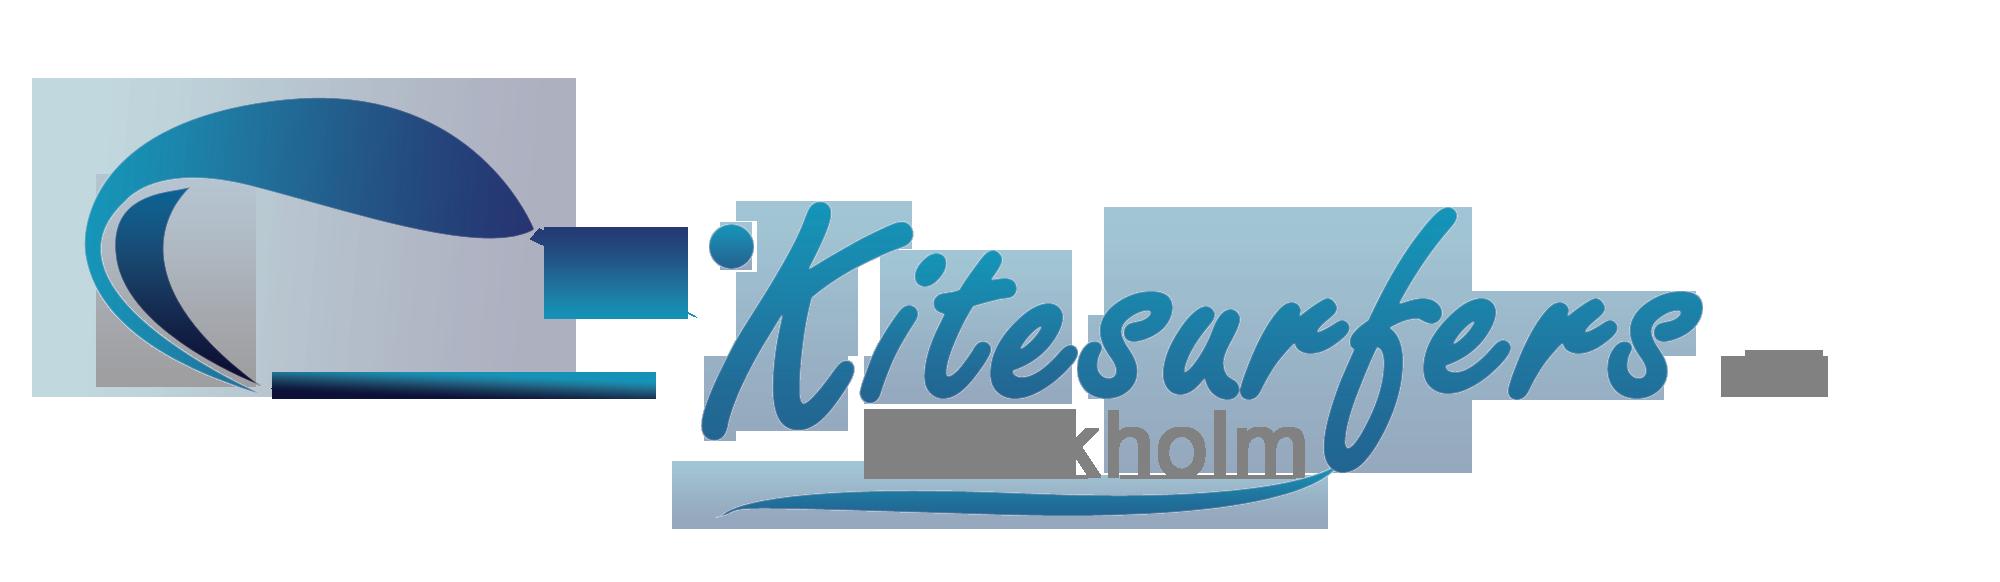 Kitesurfing & kitekurs i Stockholm